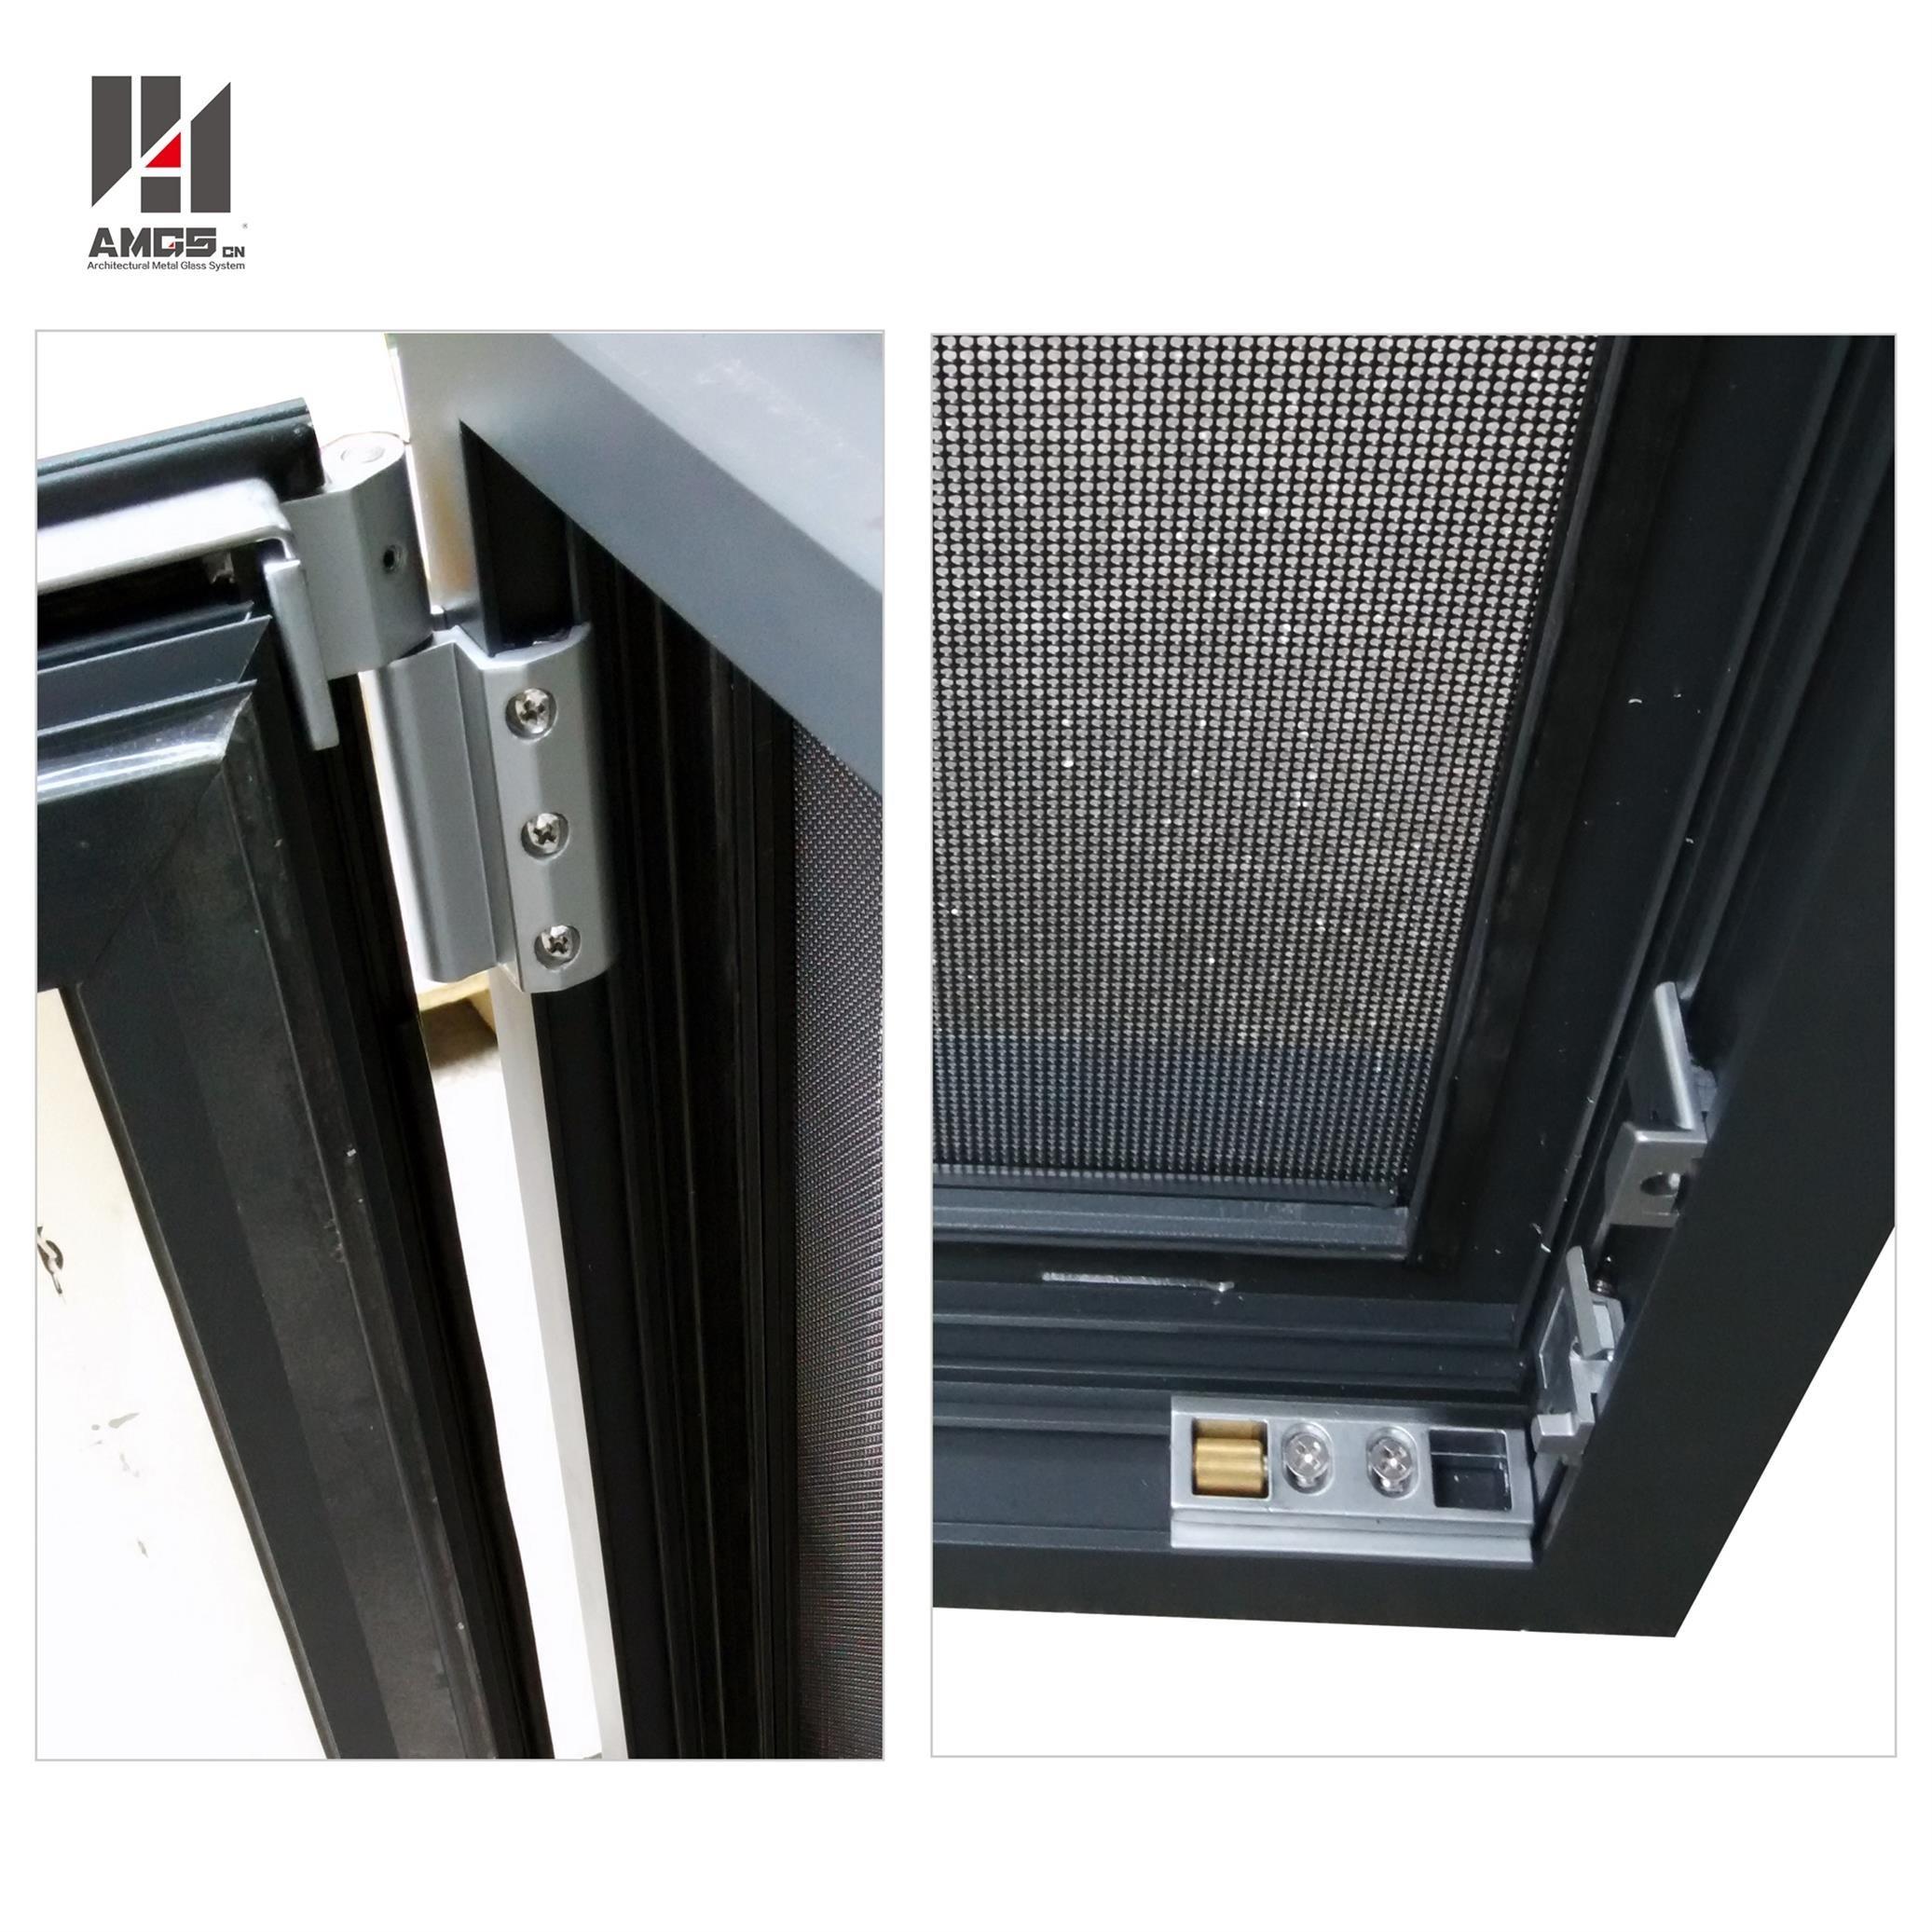 AMGS Aluminum Tilt-Turn Window With Double Glazing Glass Aluminum Tilt-turn Windows image12